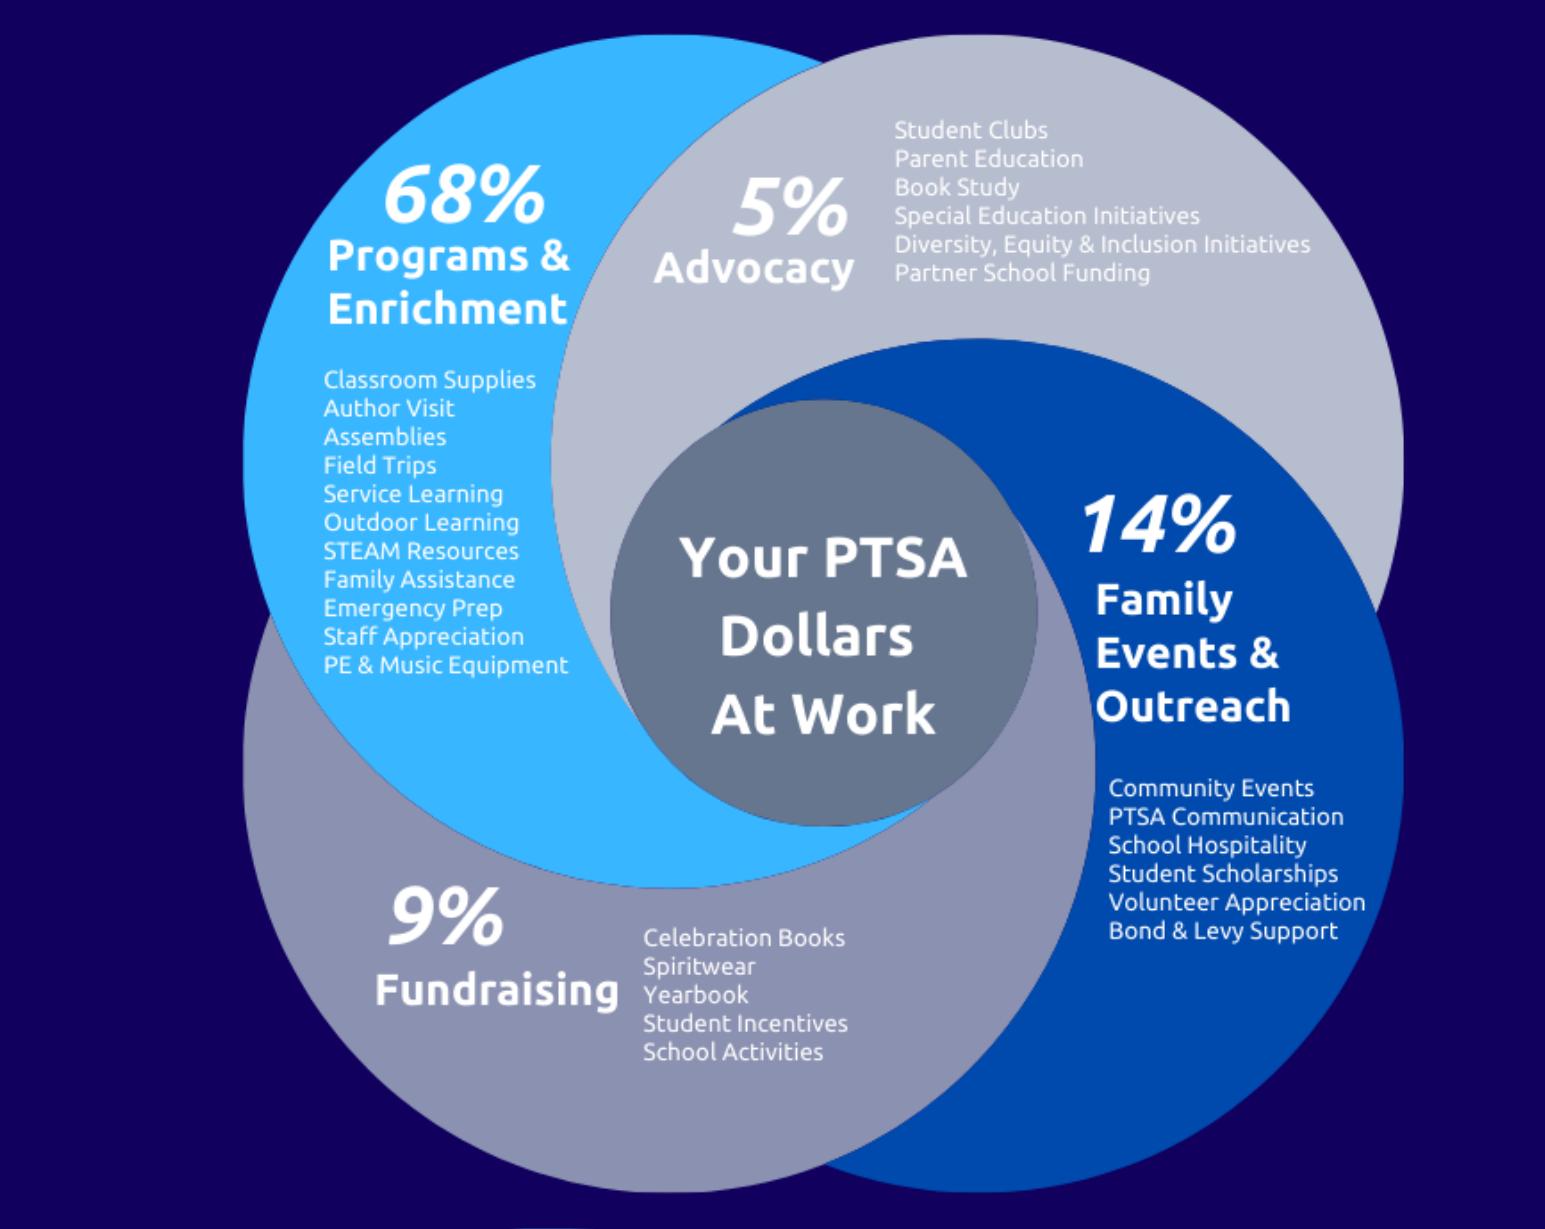 Image of PTSA Dollars at Work